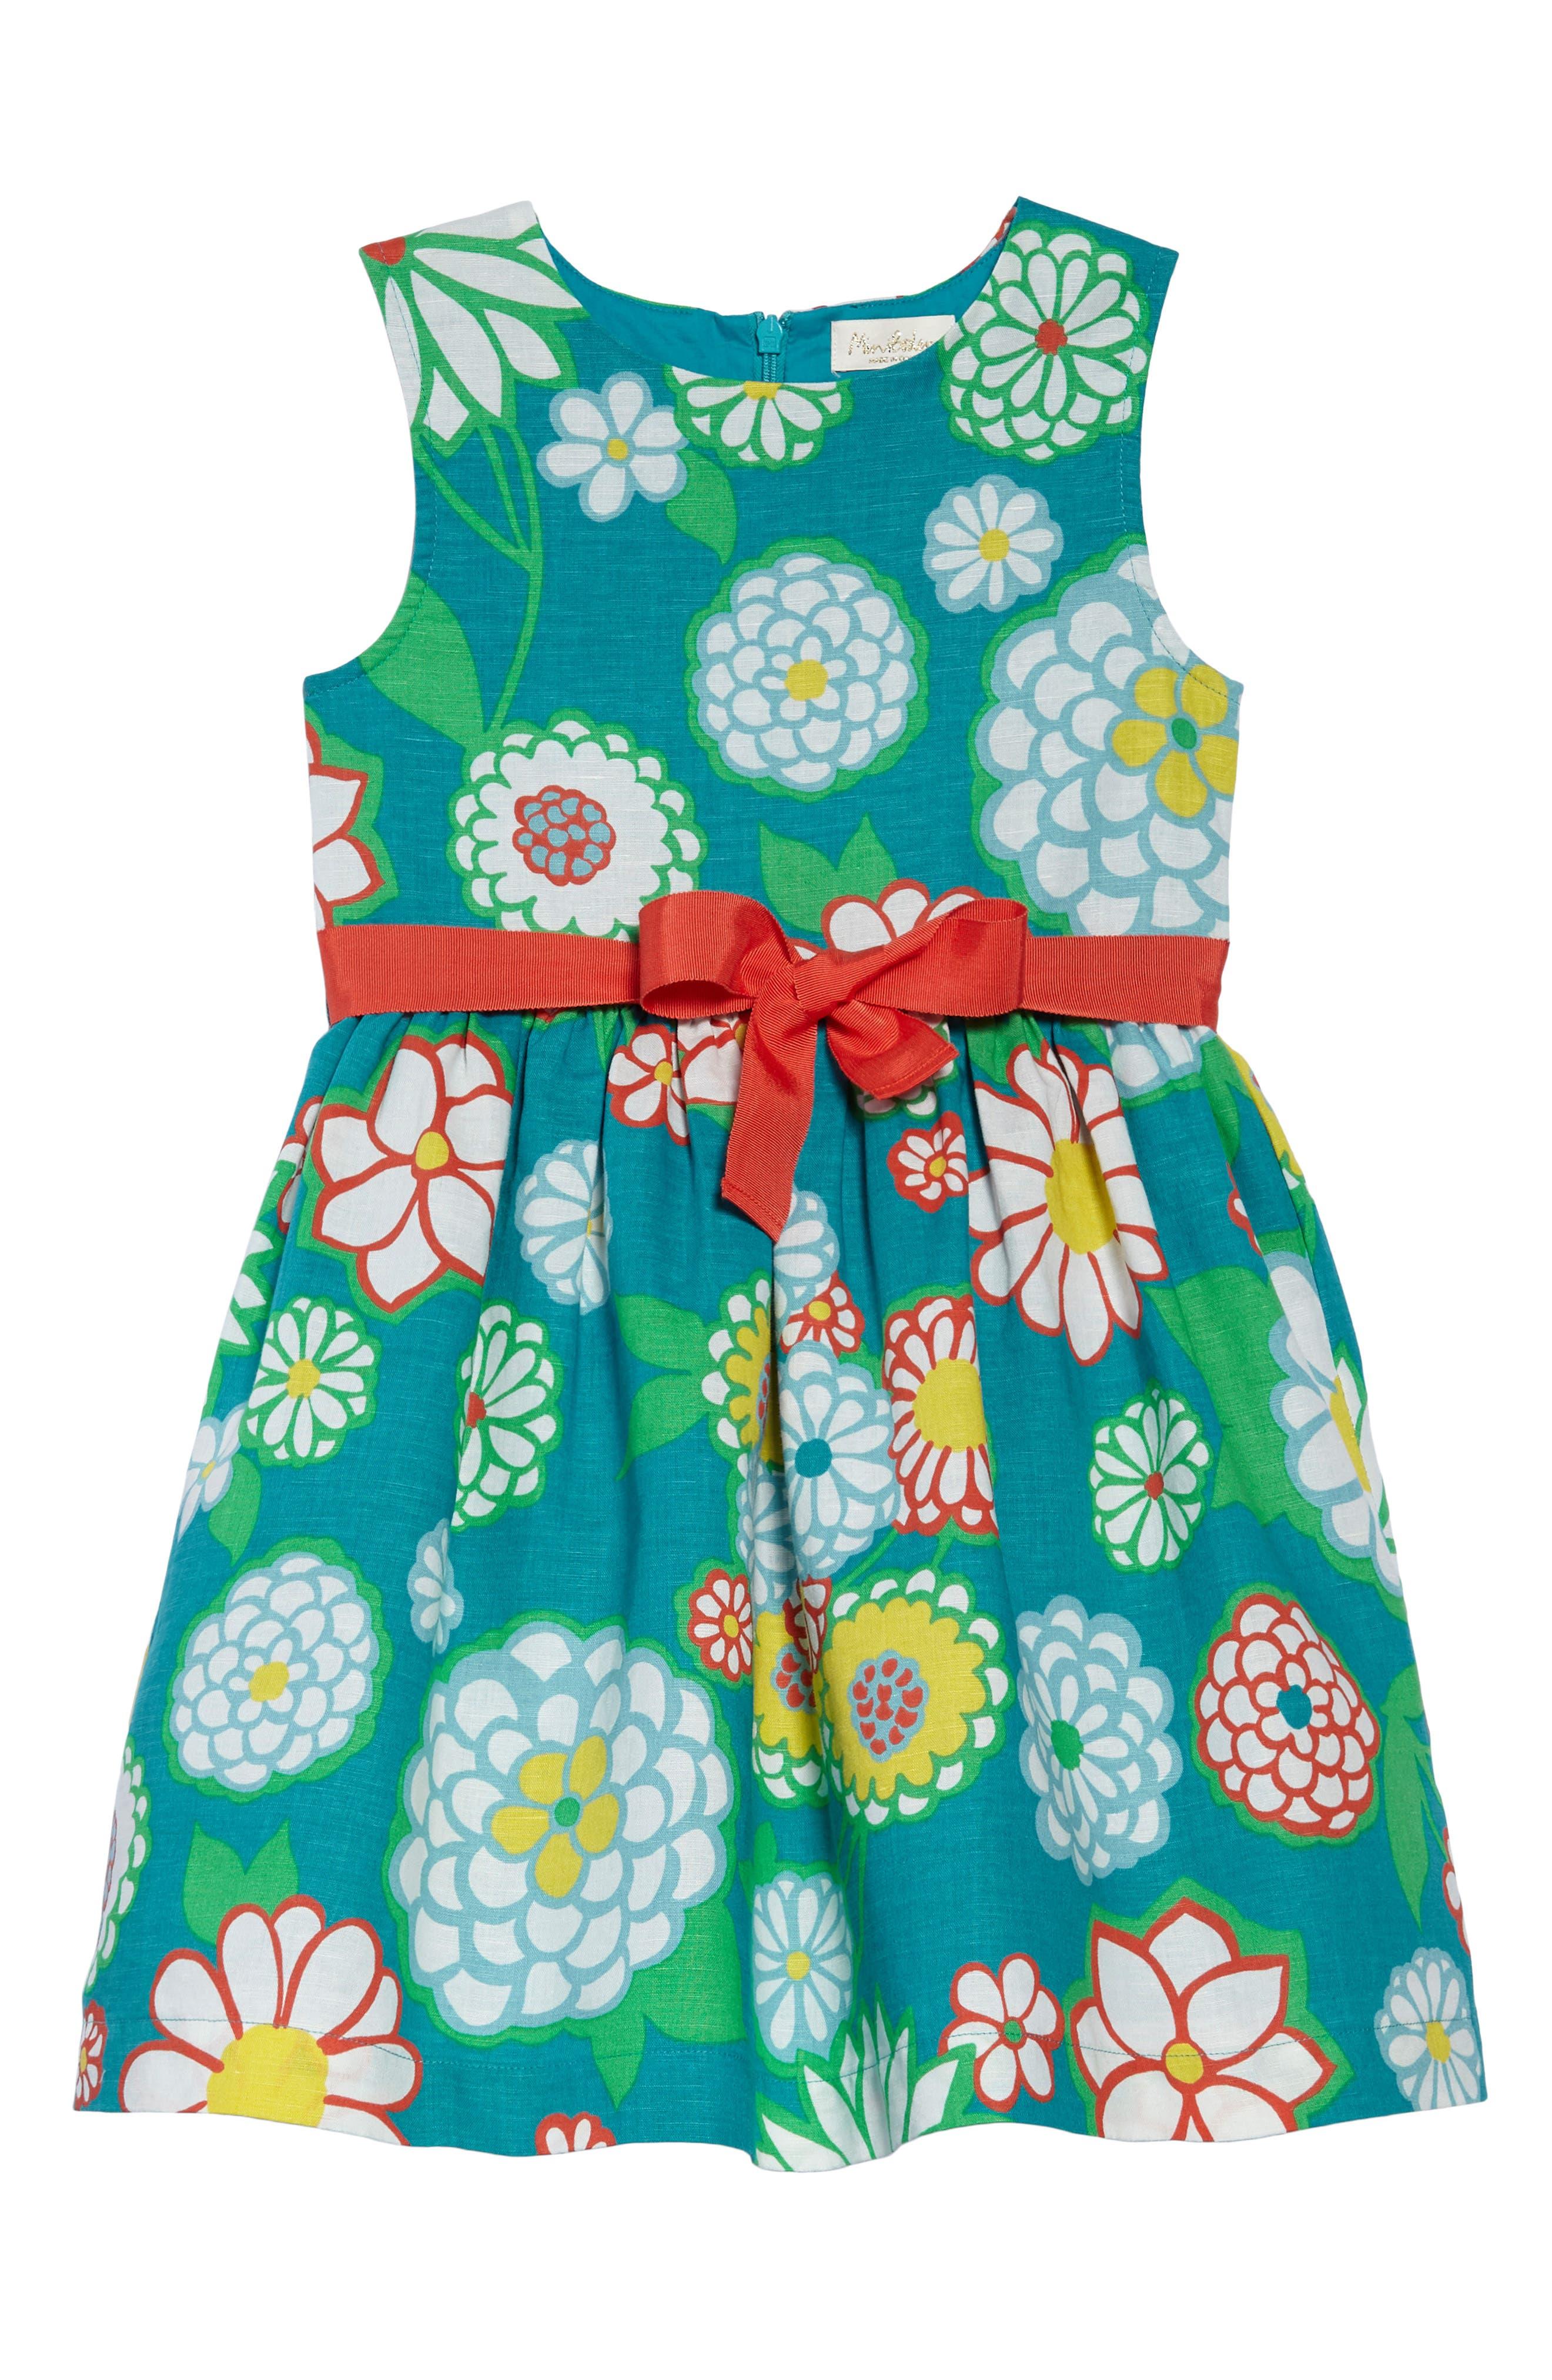 Alternate Image 1 Selected - Mini Boden Vintage Linen & Cotton Dress (Toddler Girls, Little Girls & Big Girls)